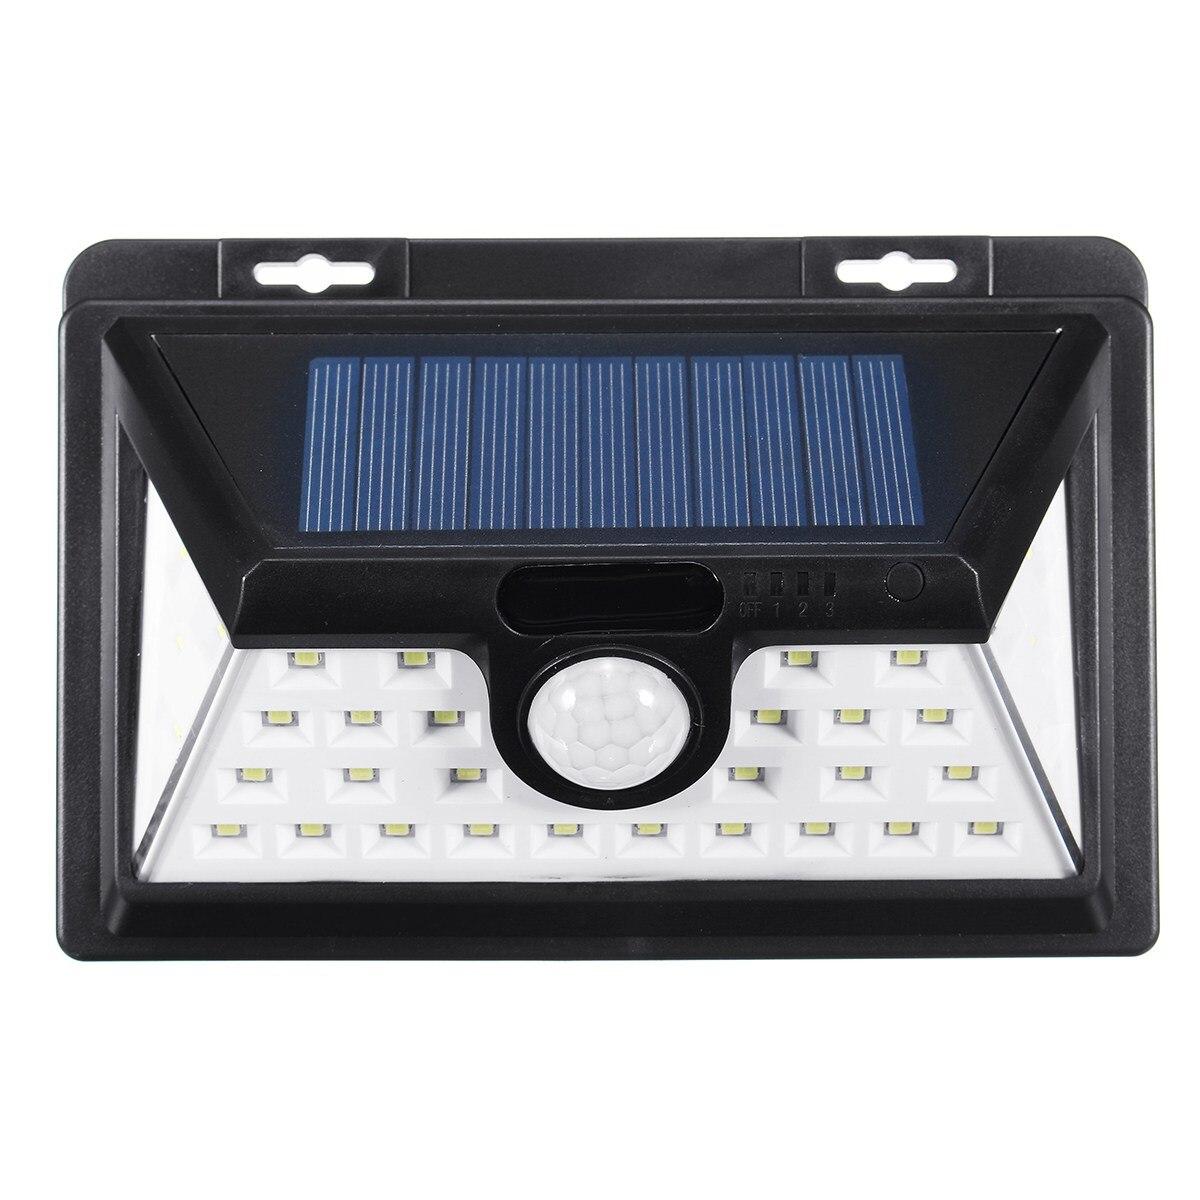 PIR Motion Sensor 34 LED Solar Power Solar Light Light Outdoor Security Wall Lamp Garden Light Waterproof